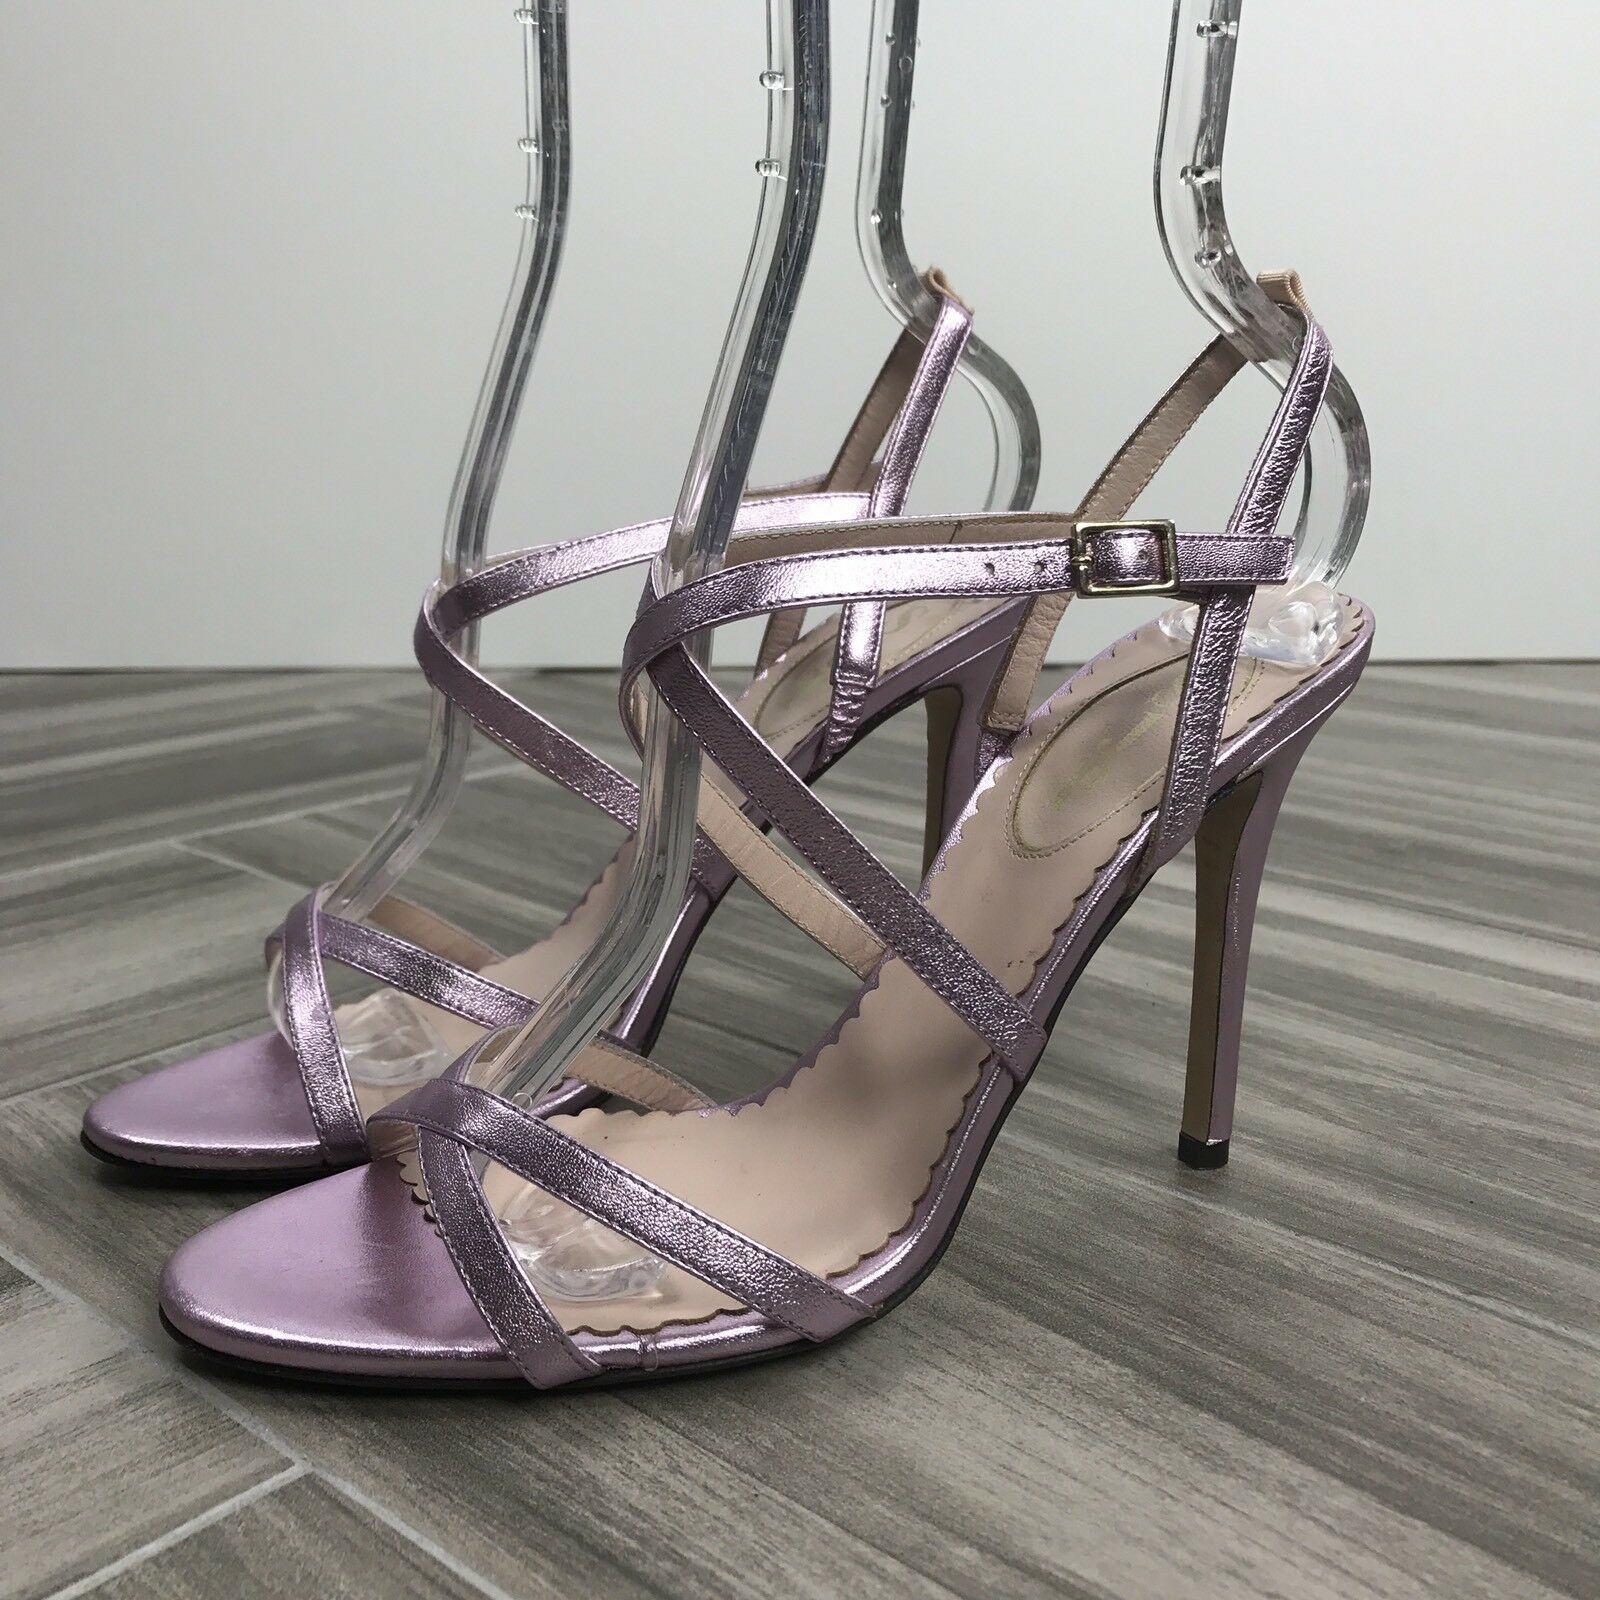 SJP Pink Metallic Strappy High Heel Sandal Size 37 Sexy, MSRP